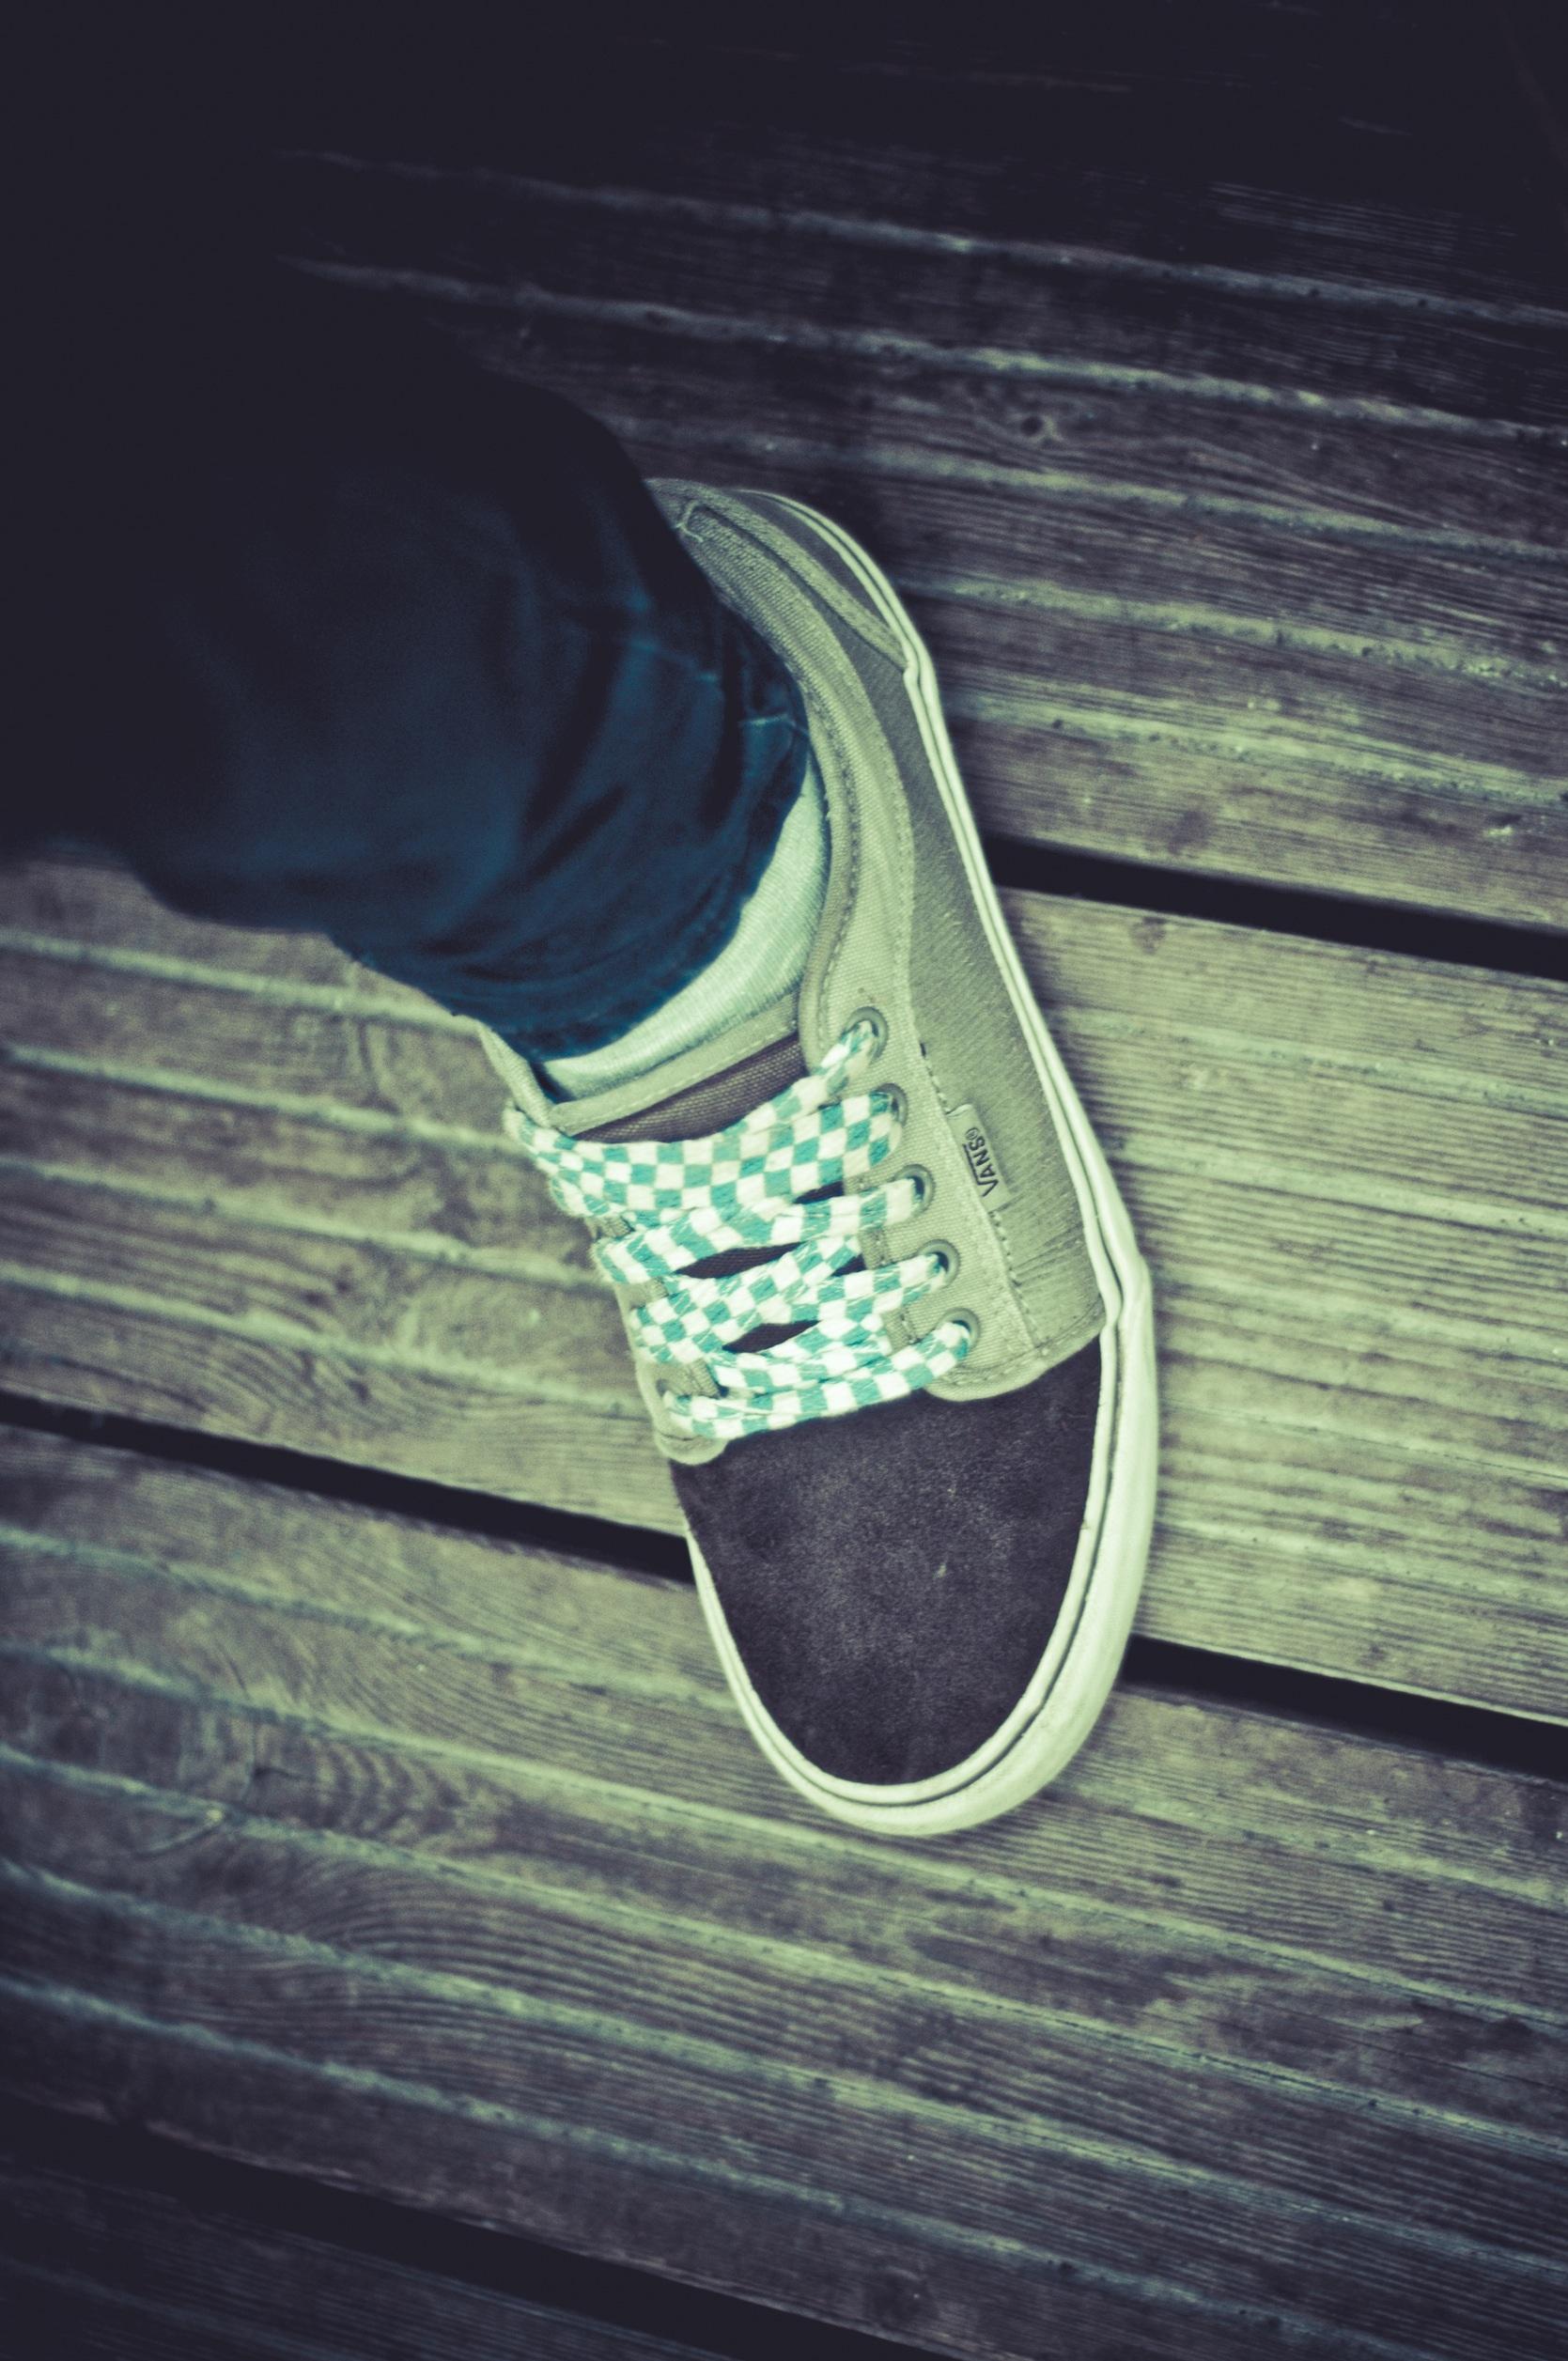 04ec390d5b shoe white leg spring green color fashion blue black human body shoes laces  sneakers footwear vans